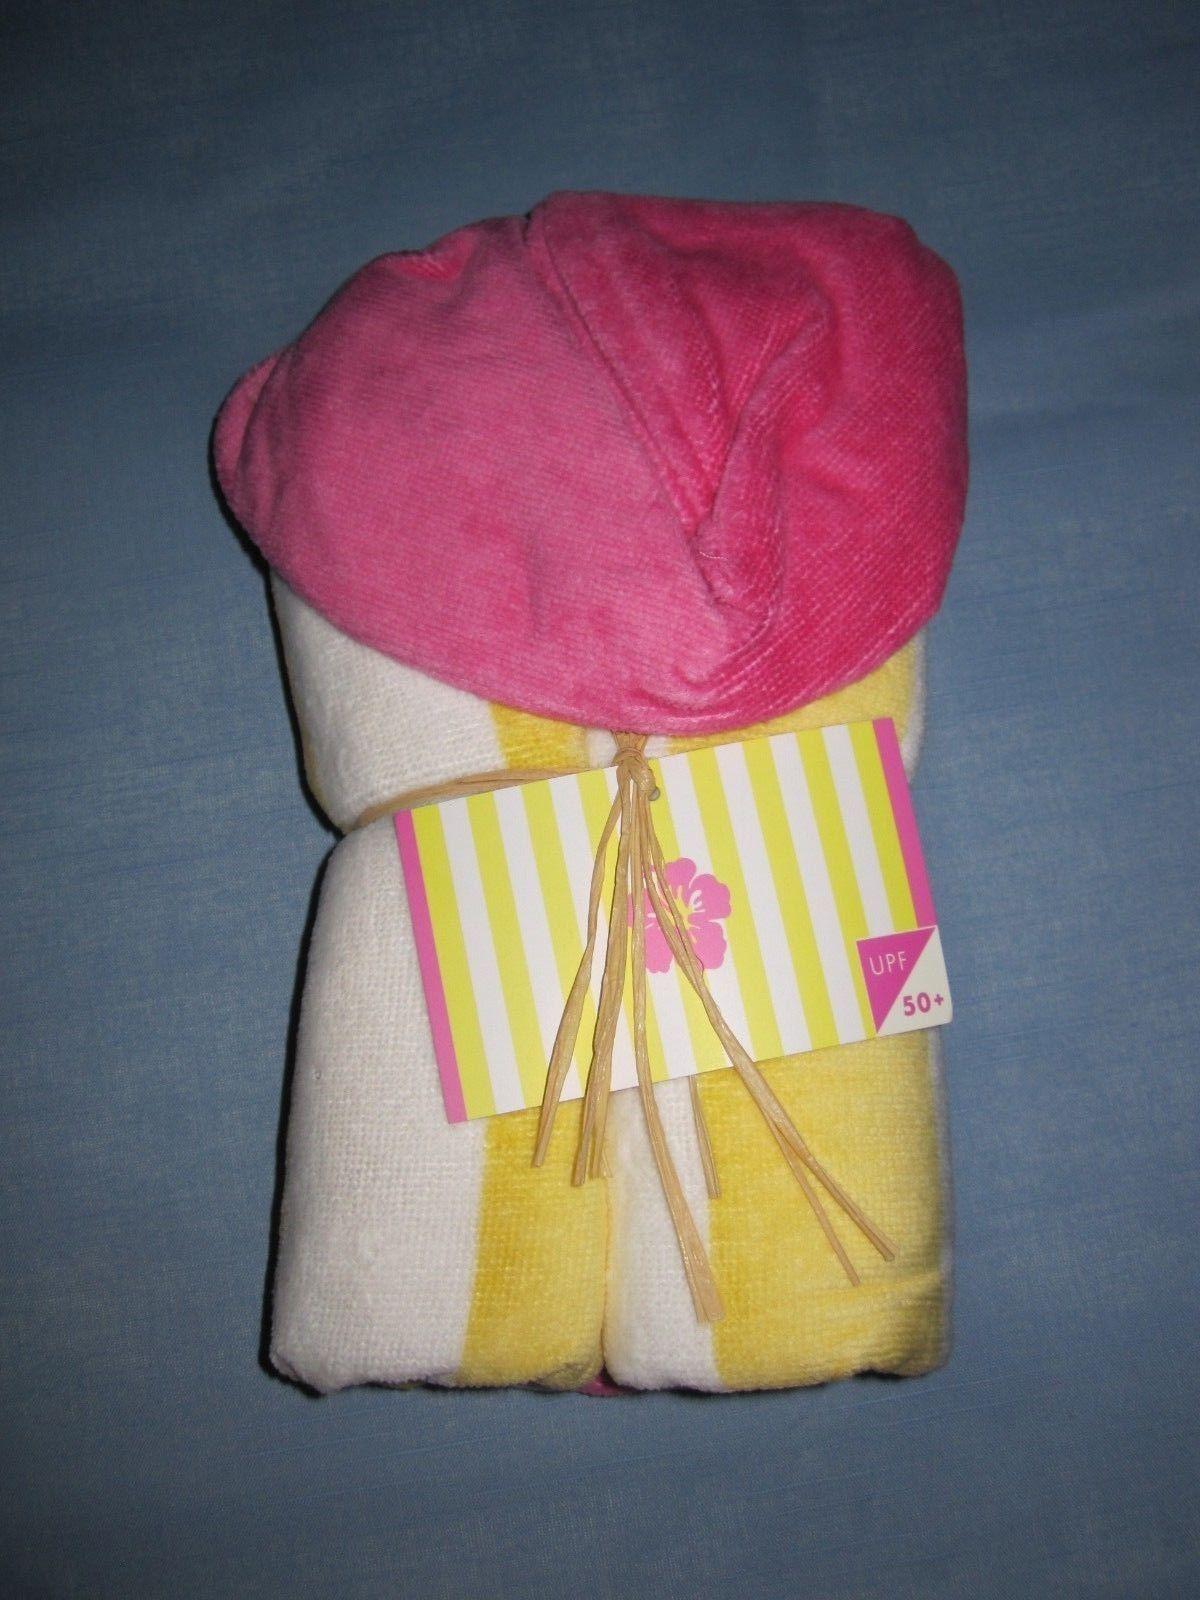 Bath 115624 Pottery Barn Kids Hooded Towel Nwt Buy It